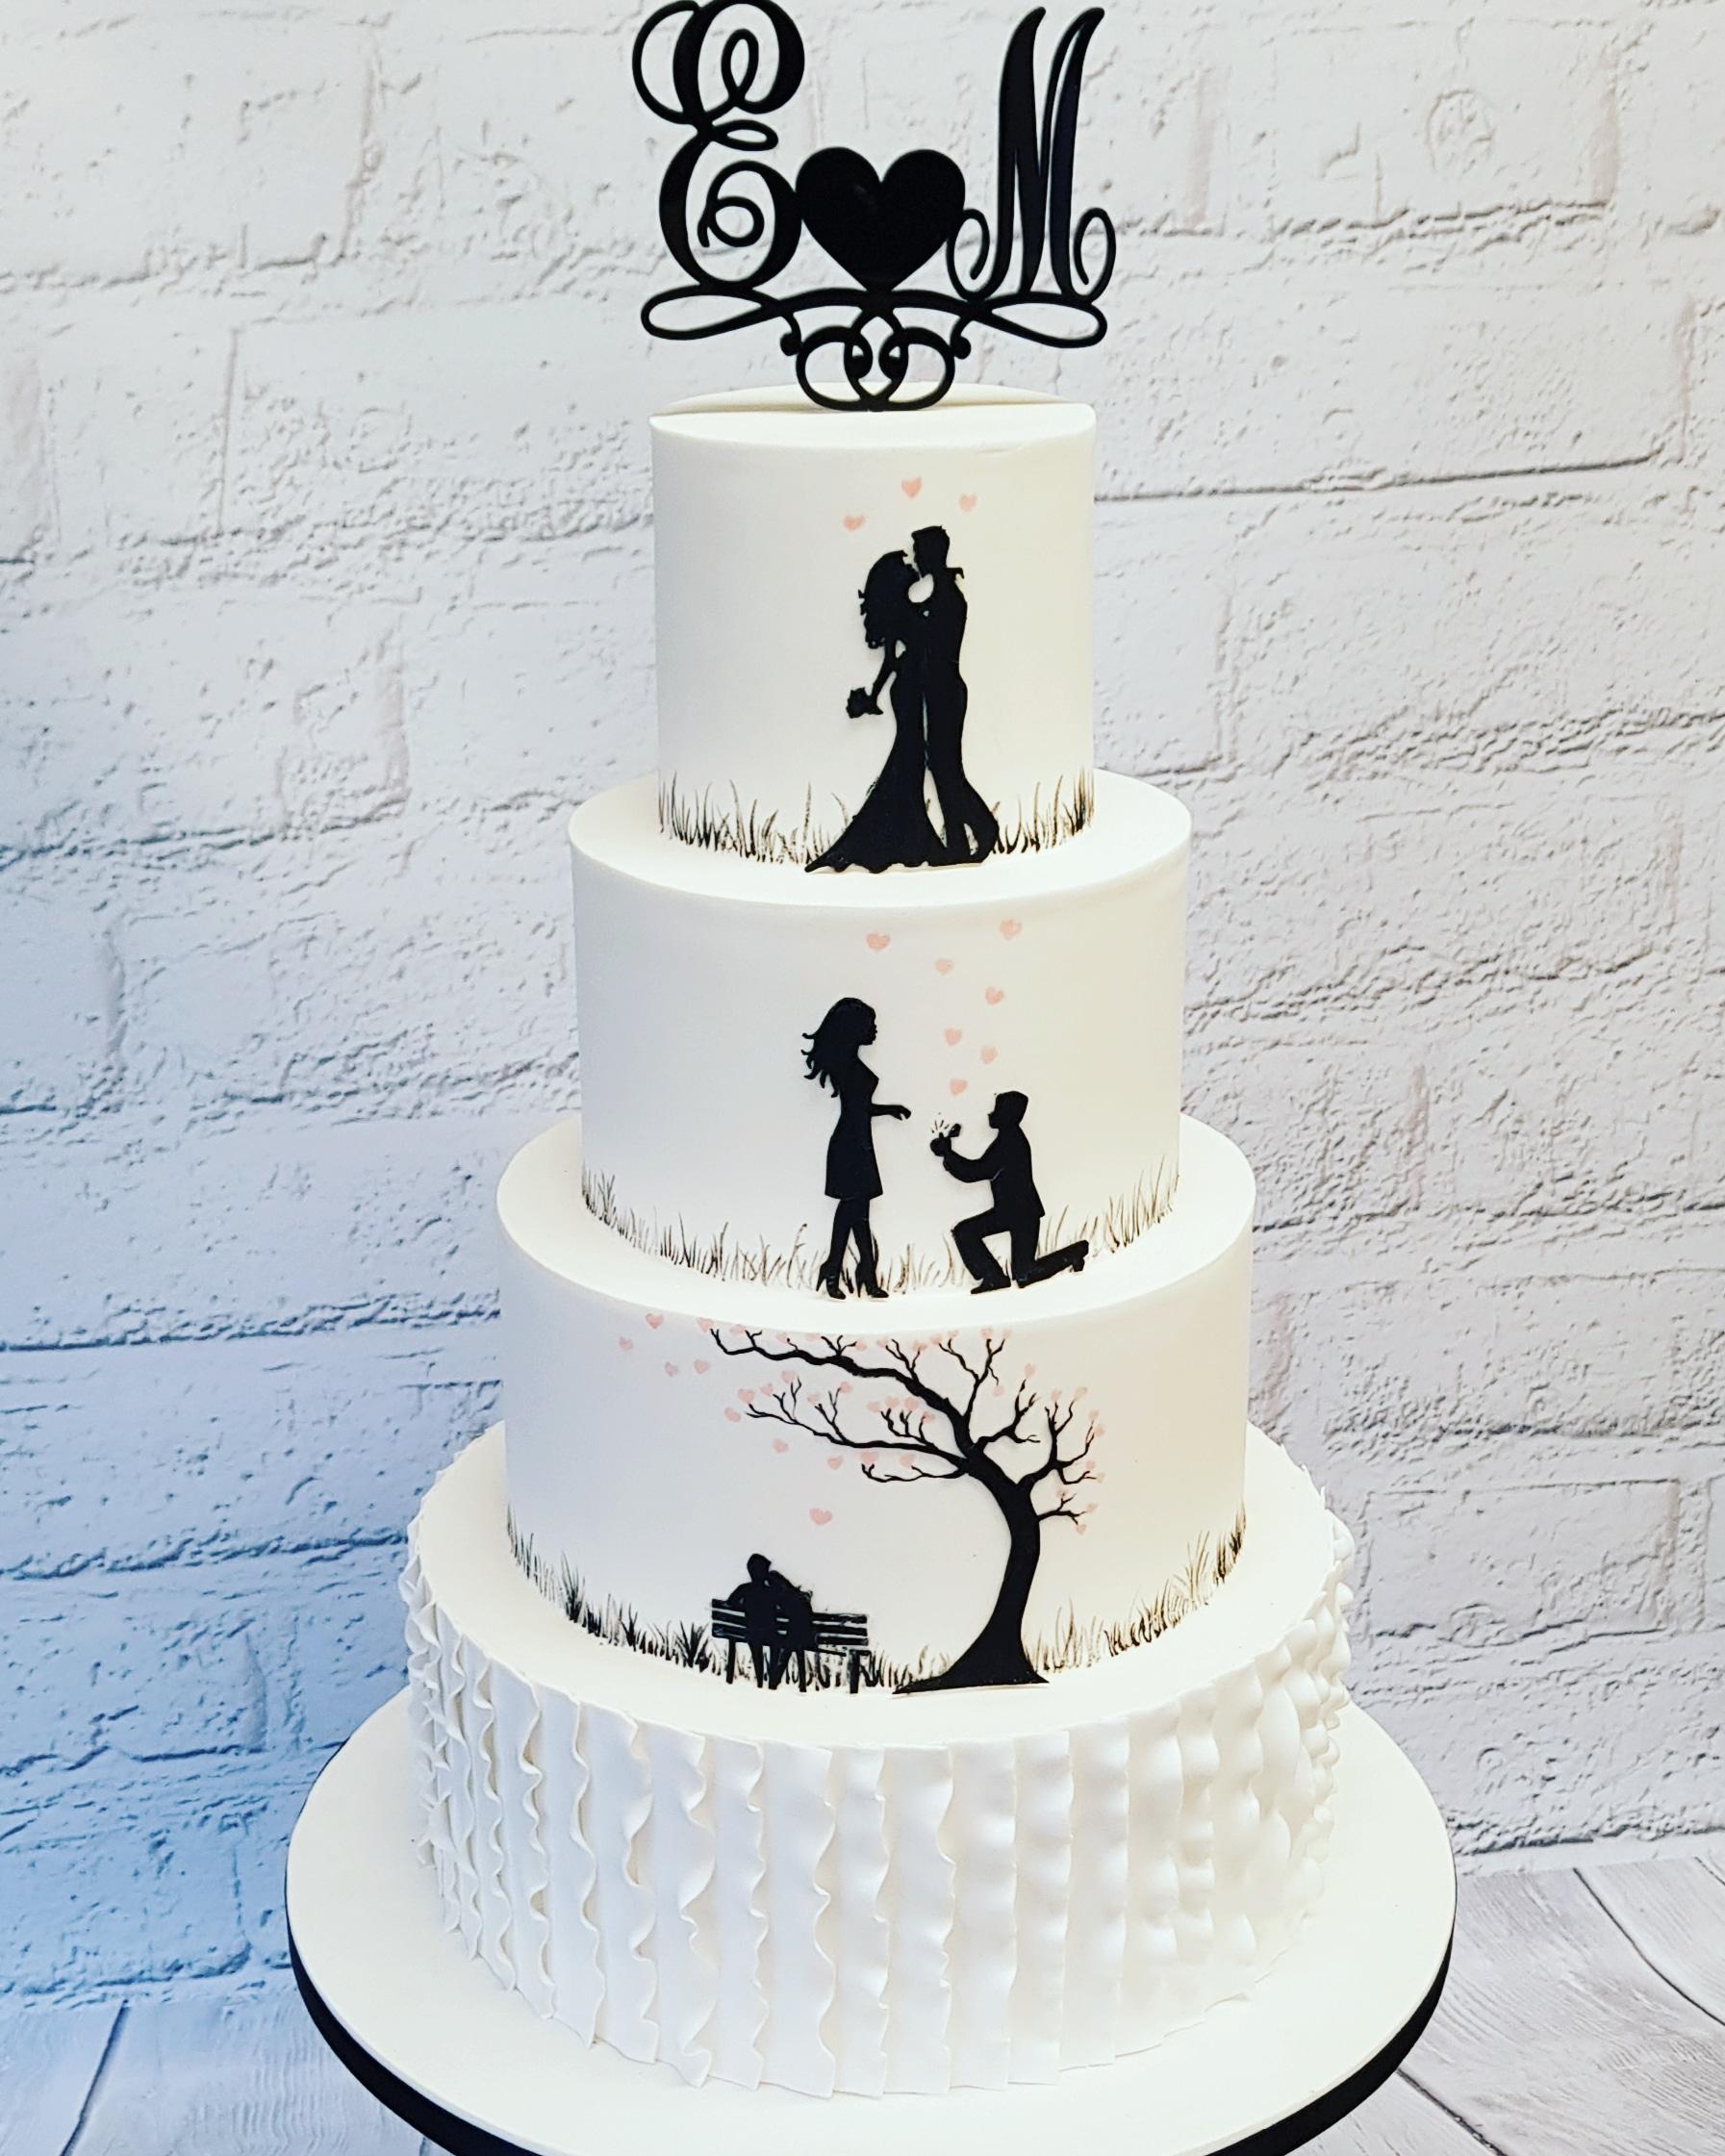 Wedding Cakes 2 Nice 2 Slice